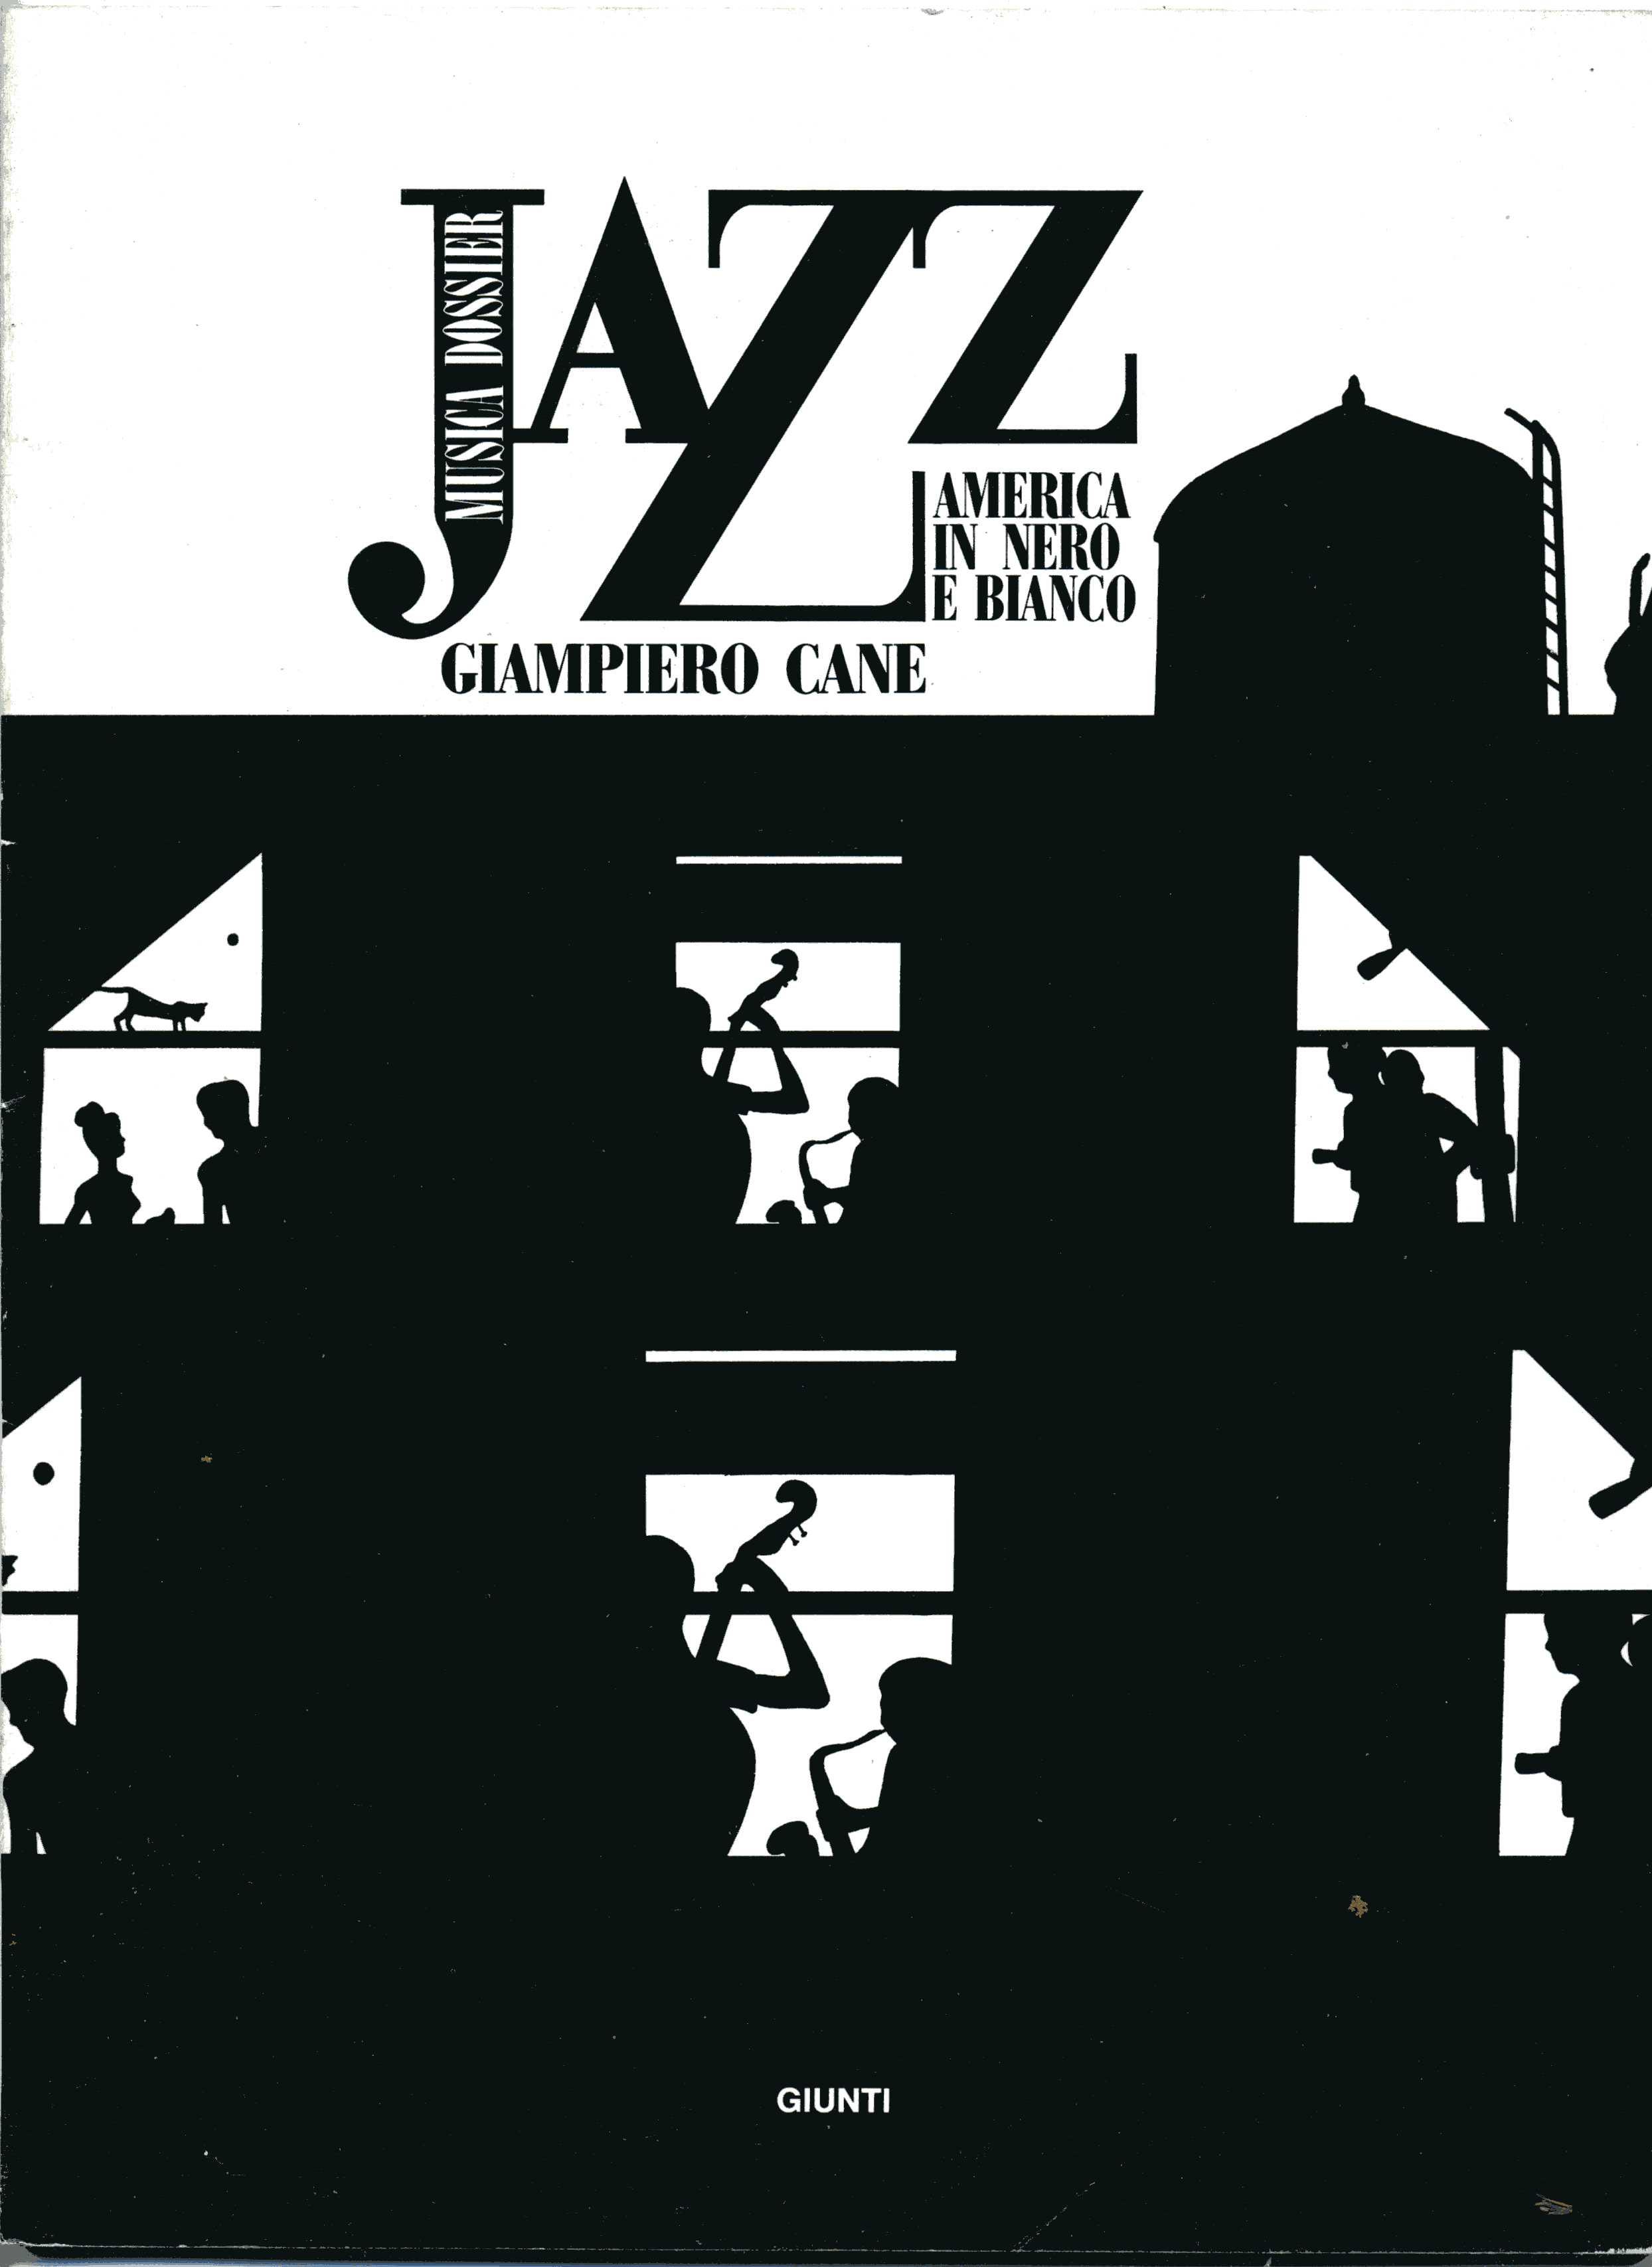 Jazz: America in nero e bianco